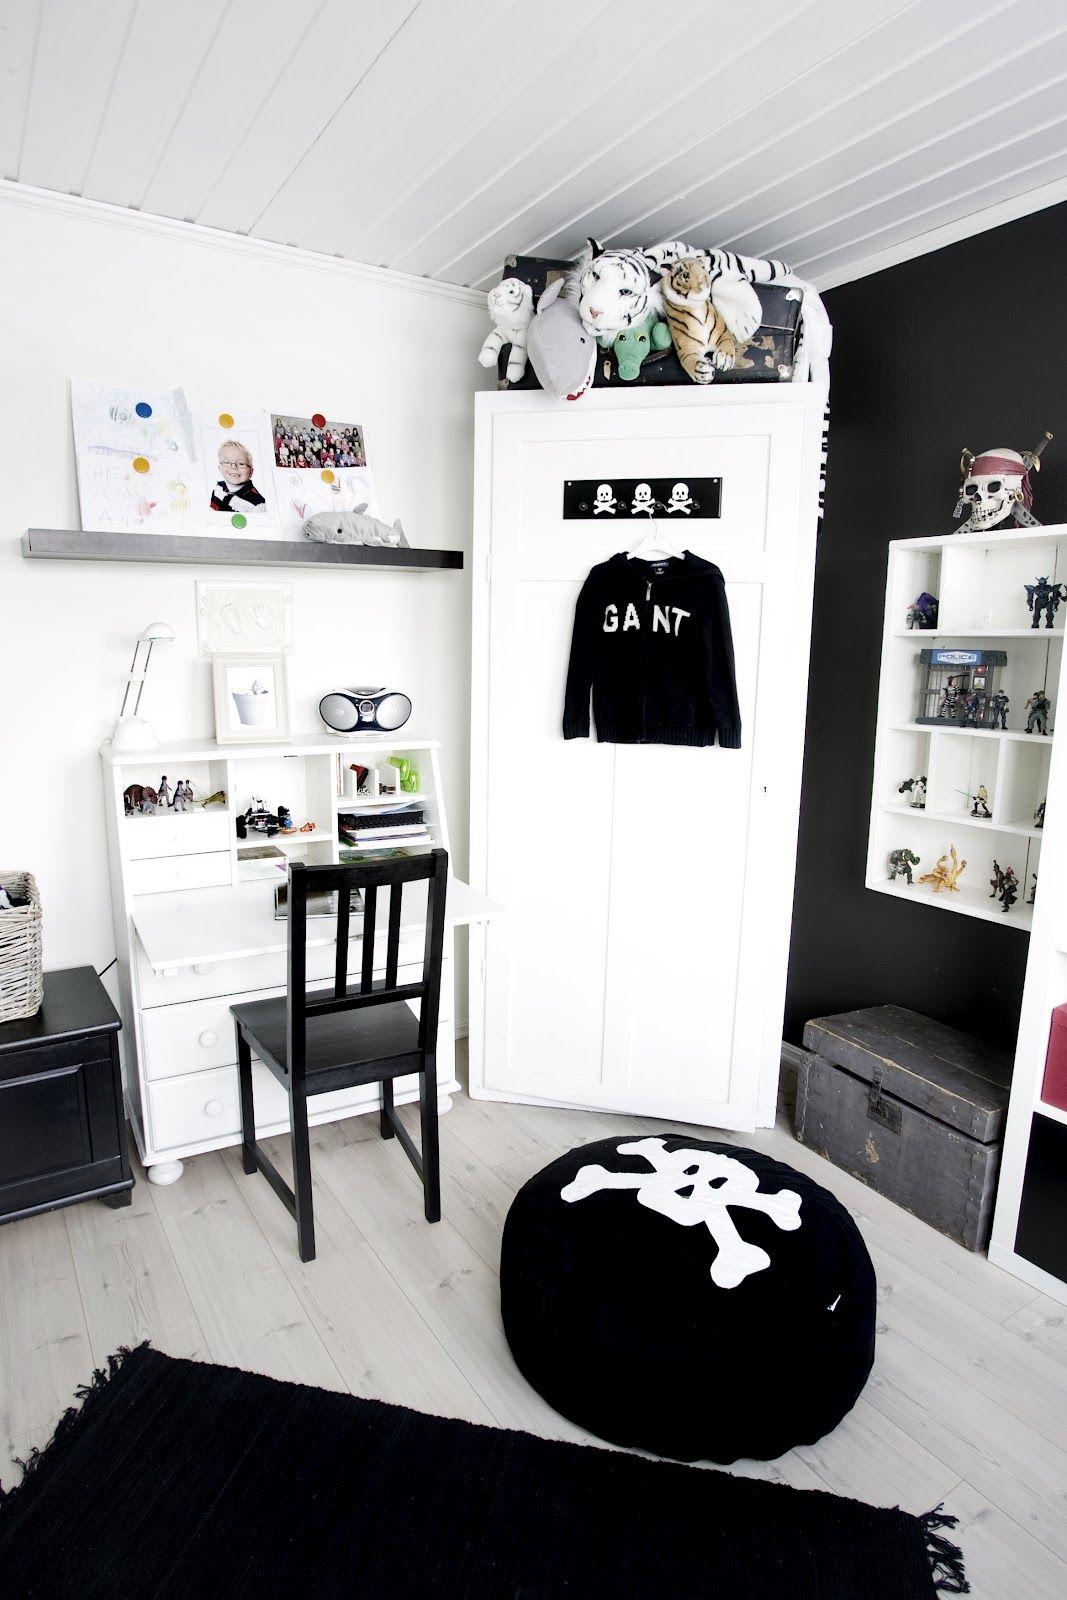 Pin by Bandit on Kids rooms | Room, Boy room, Teen boy rooms